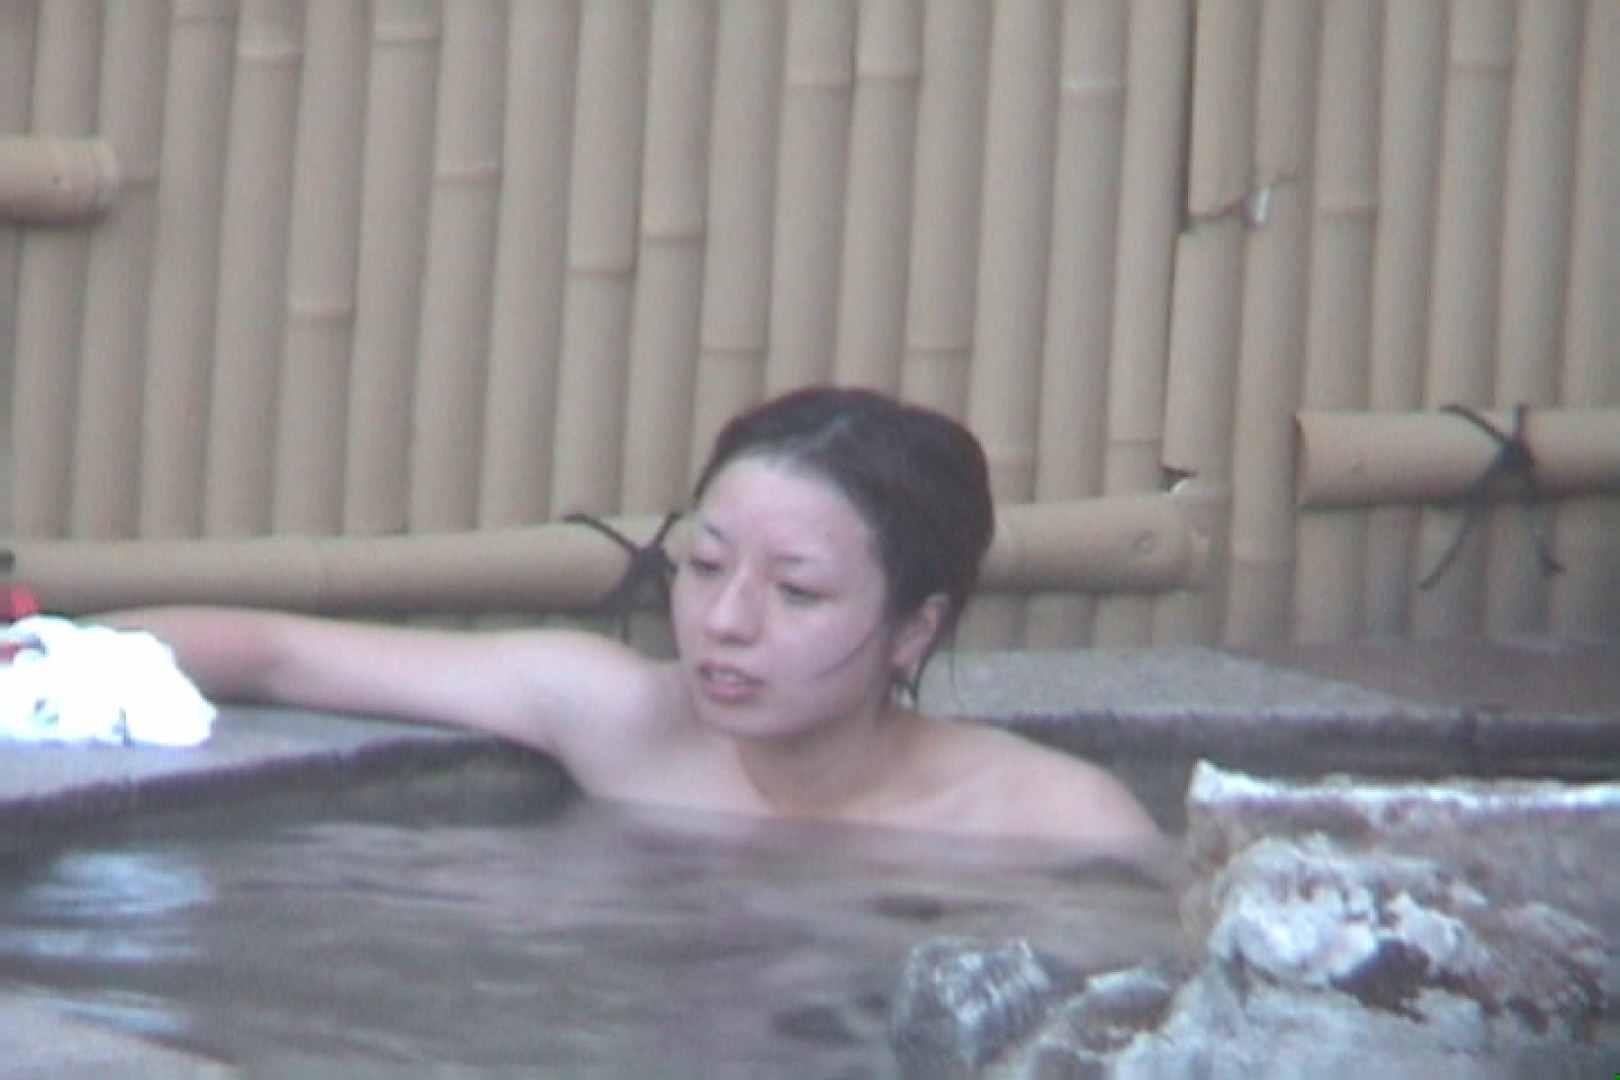 Aquaな露天風呂Vol.608 HなOL | 盗撮  89pic 46